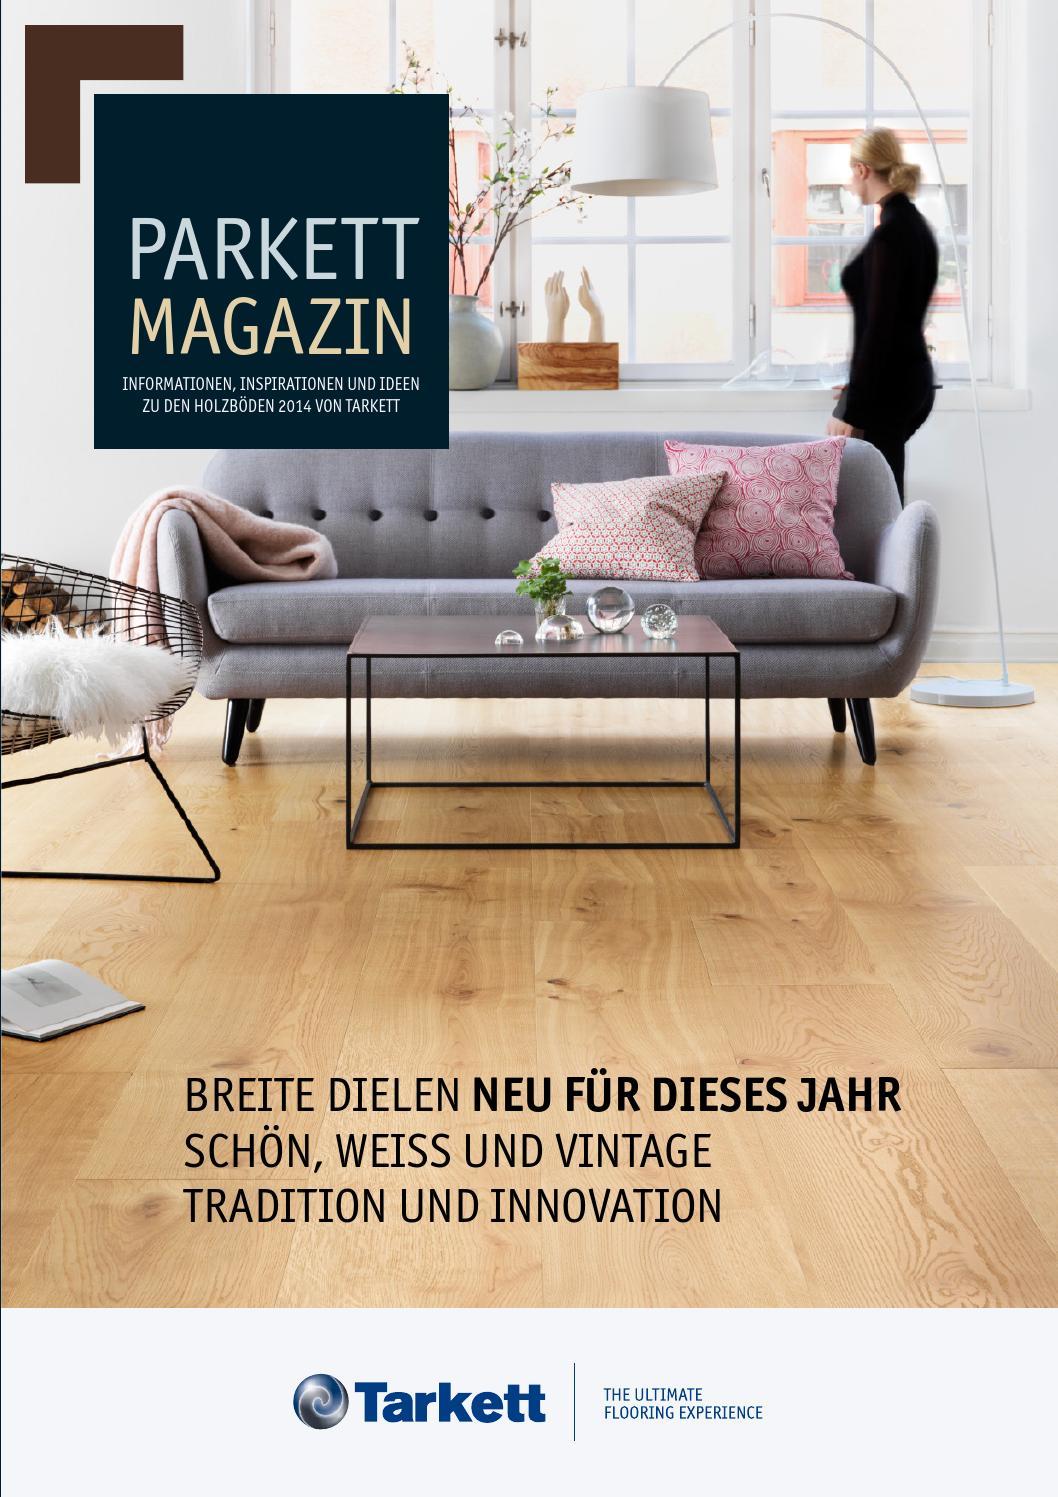 Tarkett parkettmagazin by Kaiser Design - issuu